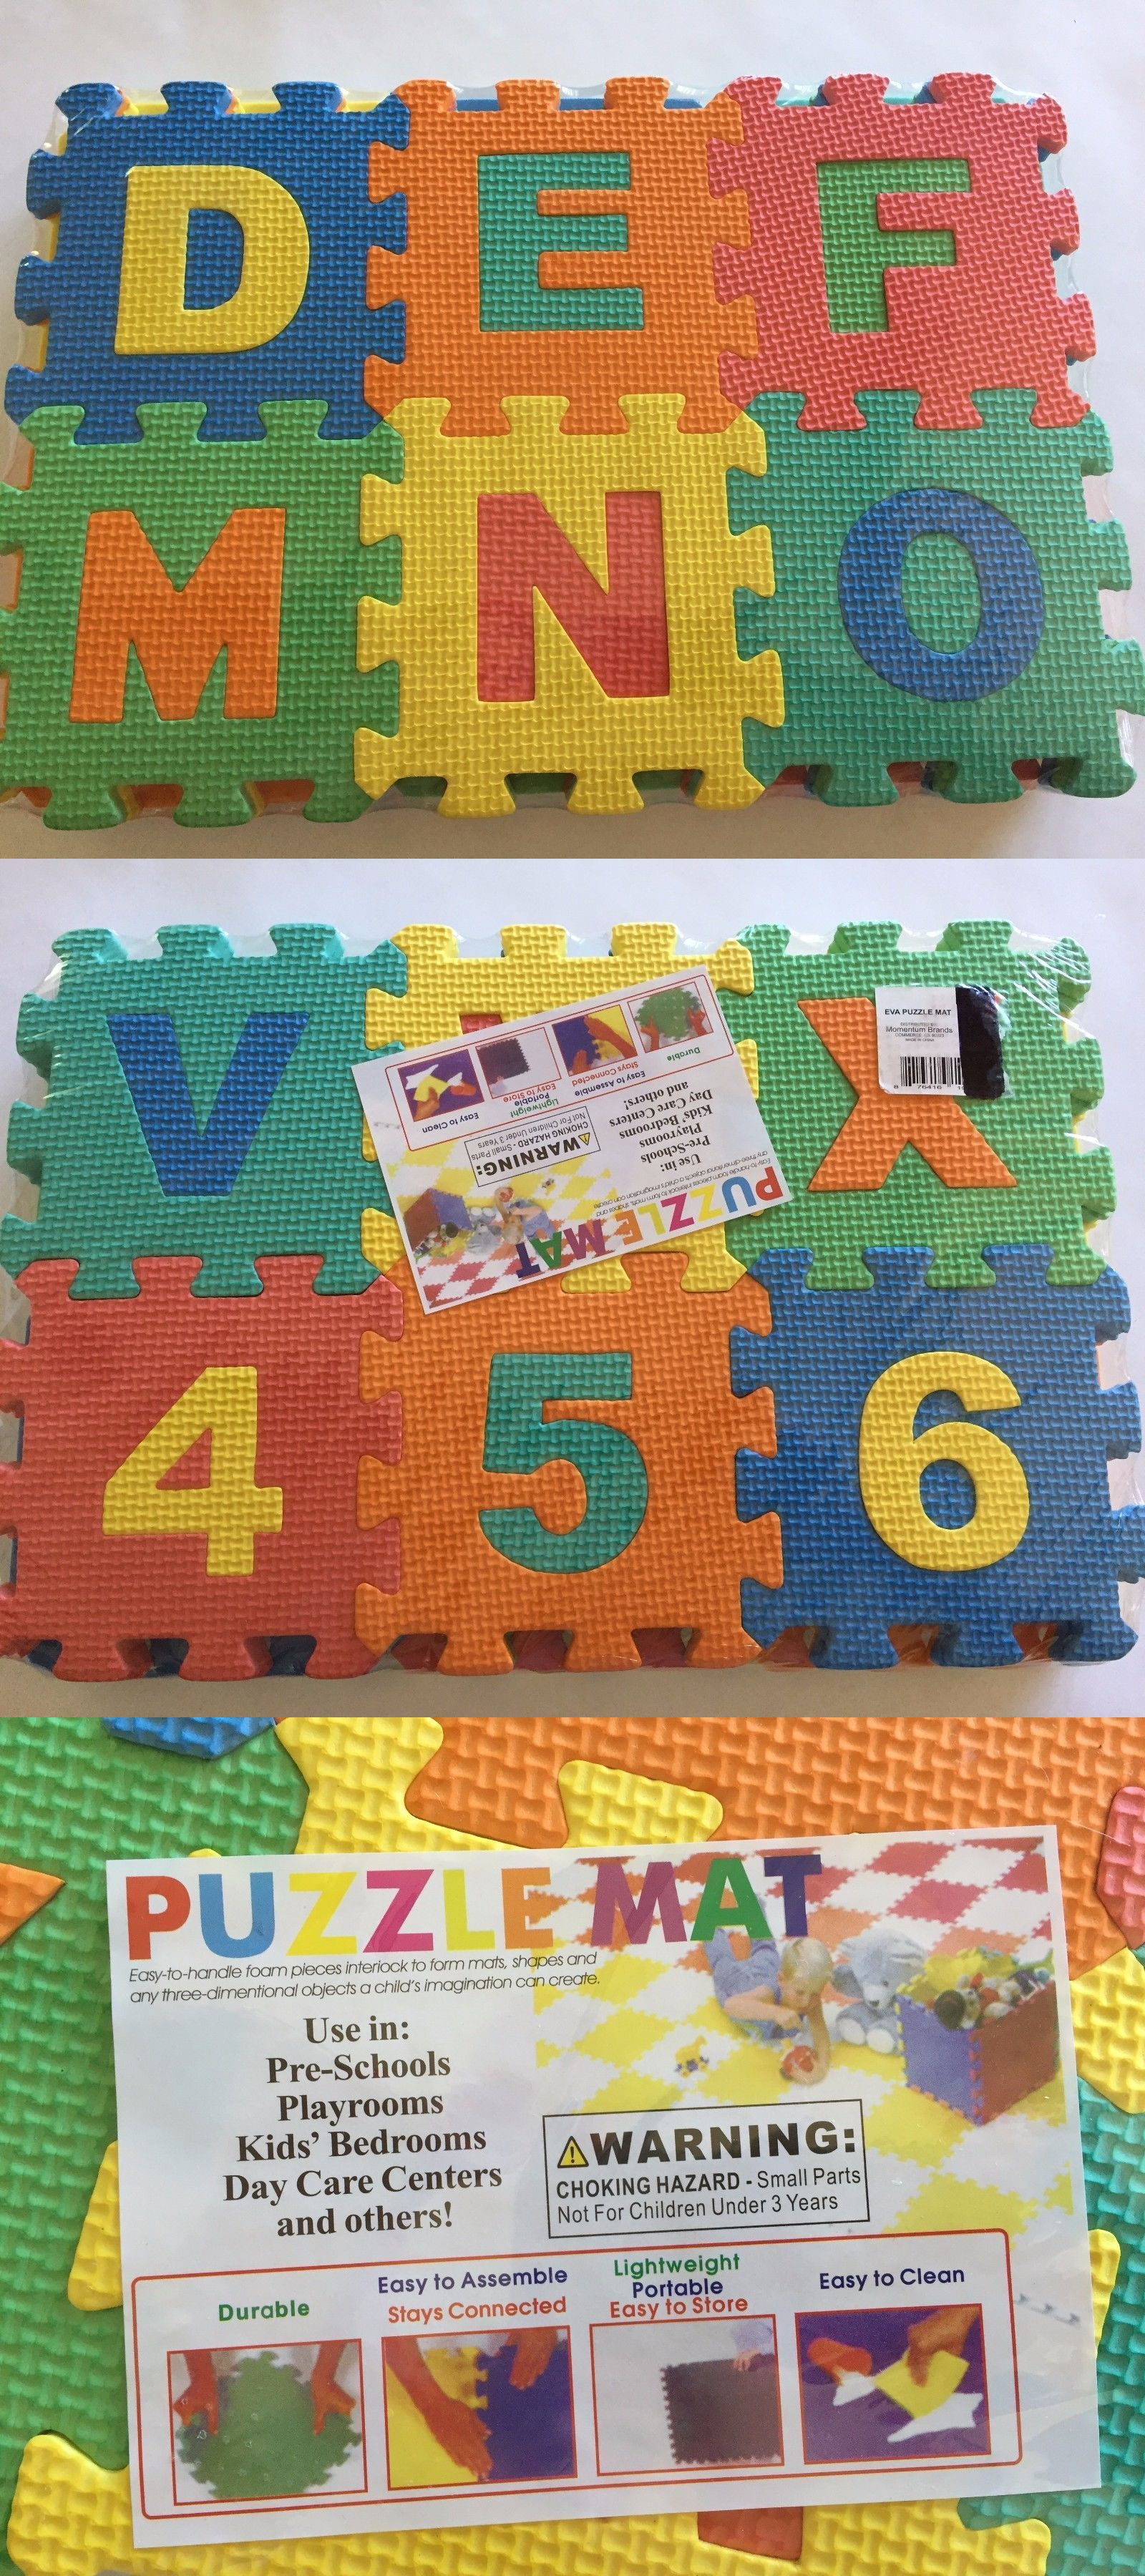 Blocks Tiles And Mats 145931 Preschool Alphabet Number Floor Exercise Mat 36 Pcs Foam Puzzle Educational To Alphabet Preschool Kids Playmat Childrens Play Mat